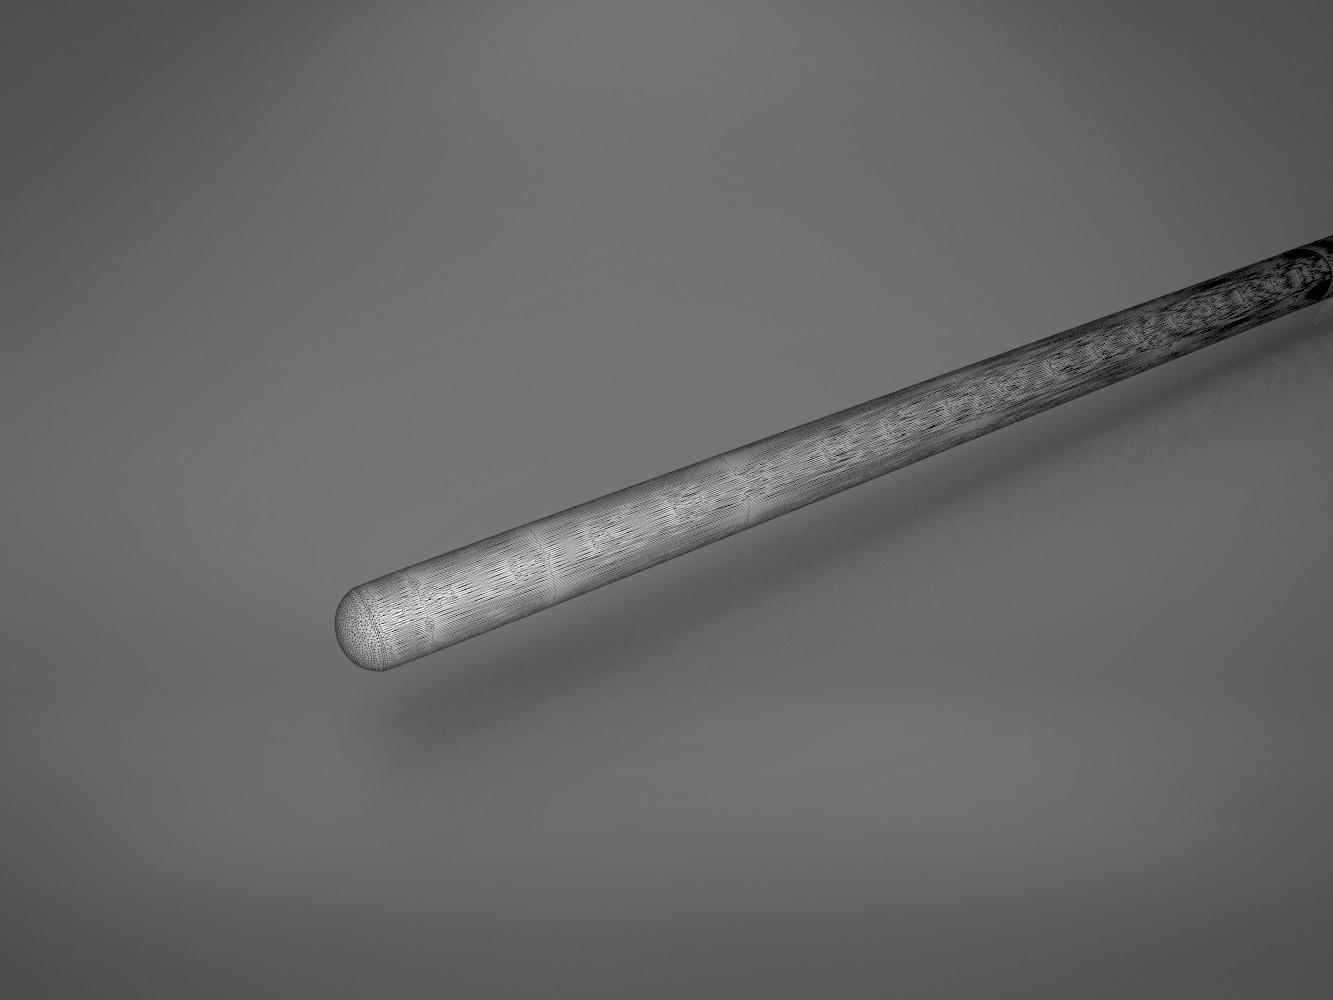 Potter2-detail_5.853.jpg Download STL file Harry Potter Wand version 2 - Harry Potter 3D print model • 3D print model, 3D-mon